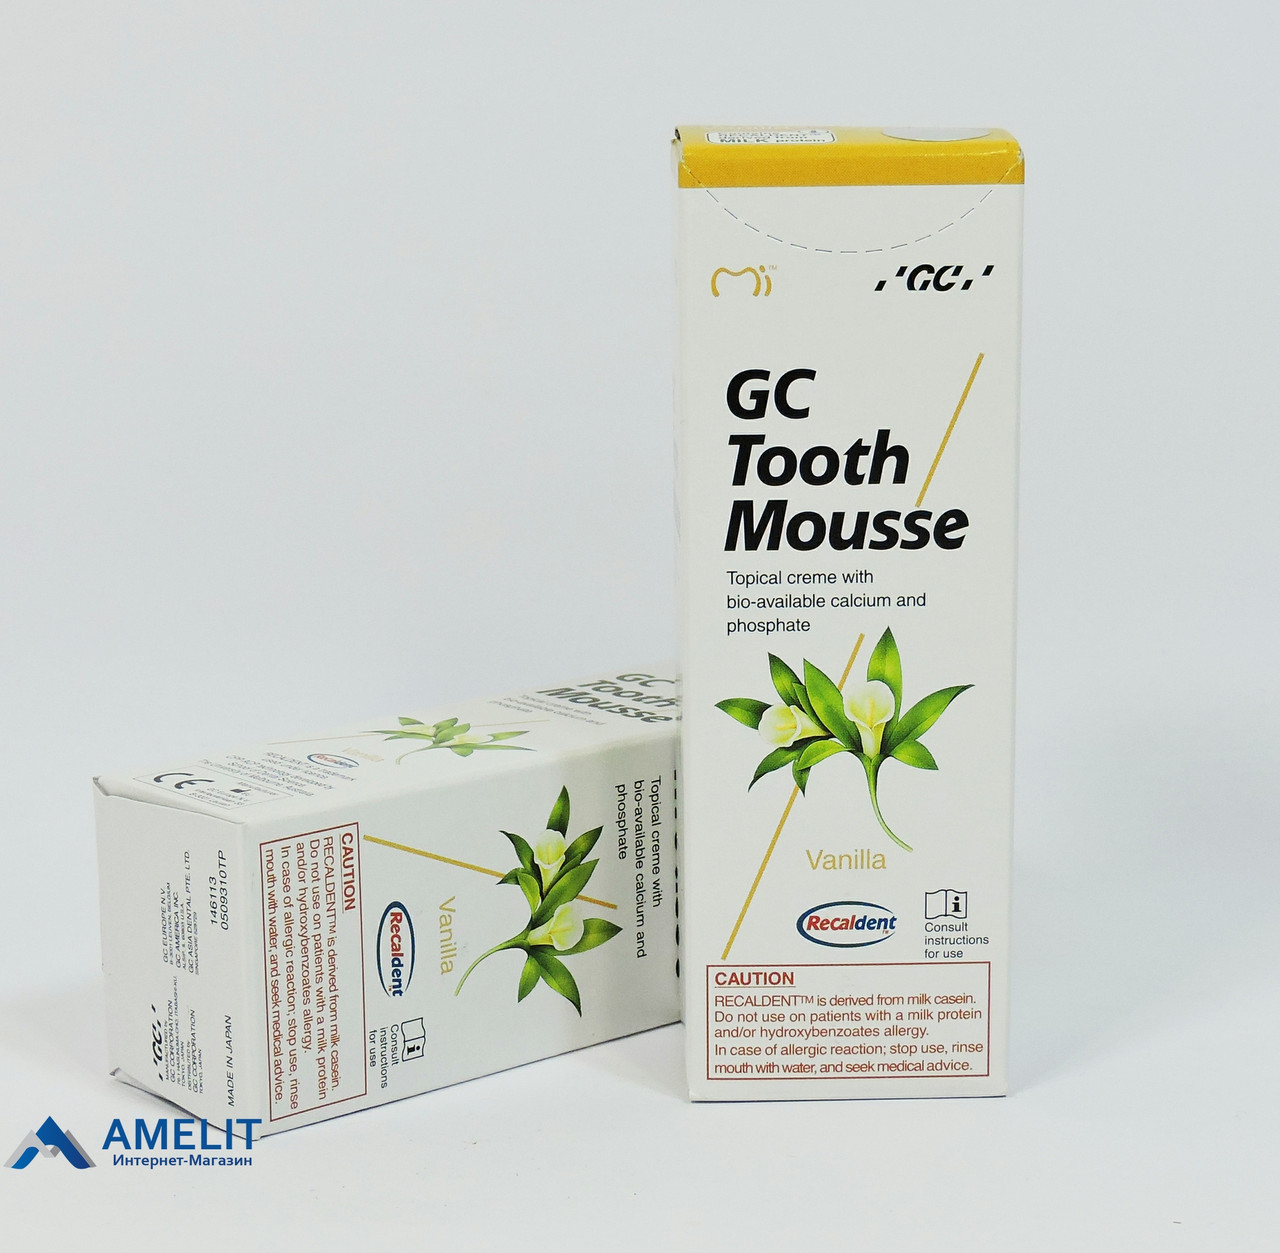 Тусс Мусс Ваниль(Tooth Mousse, GC), крем-паста 40гр/35мл